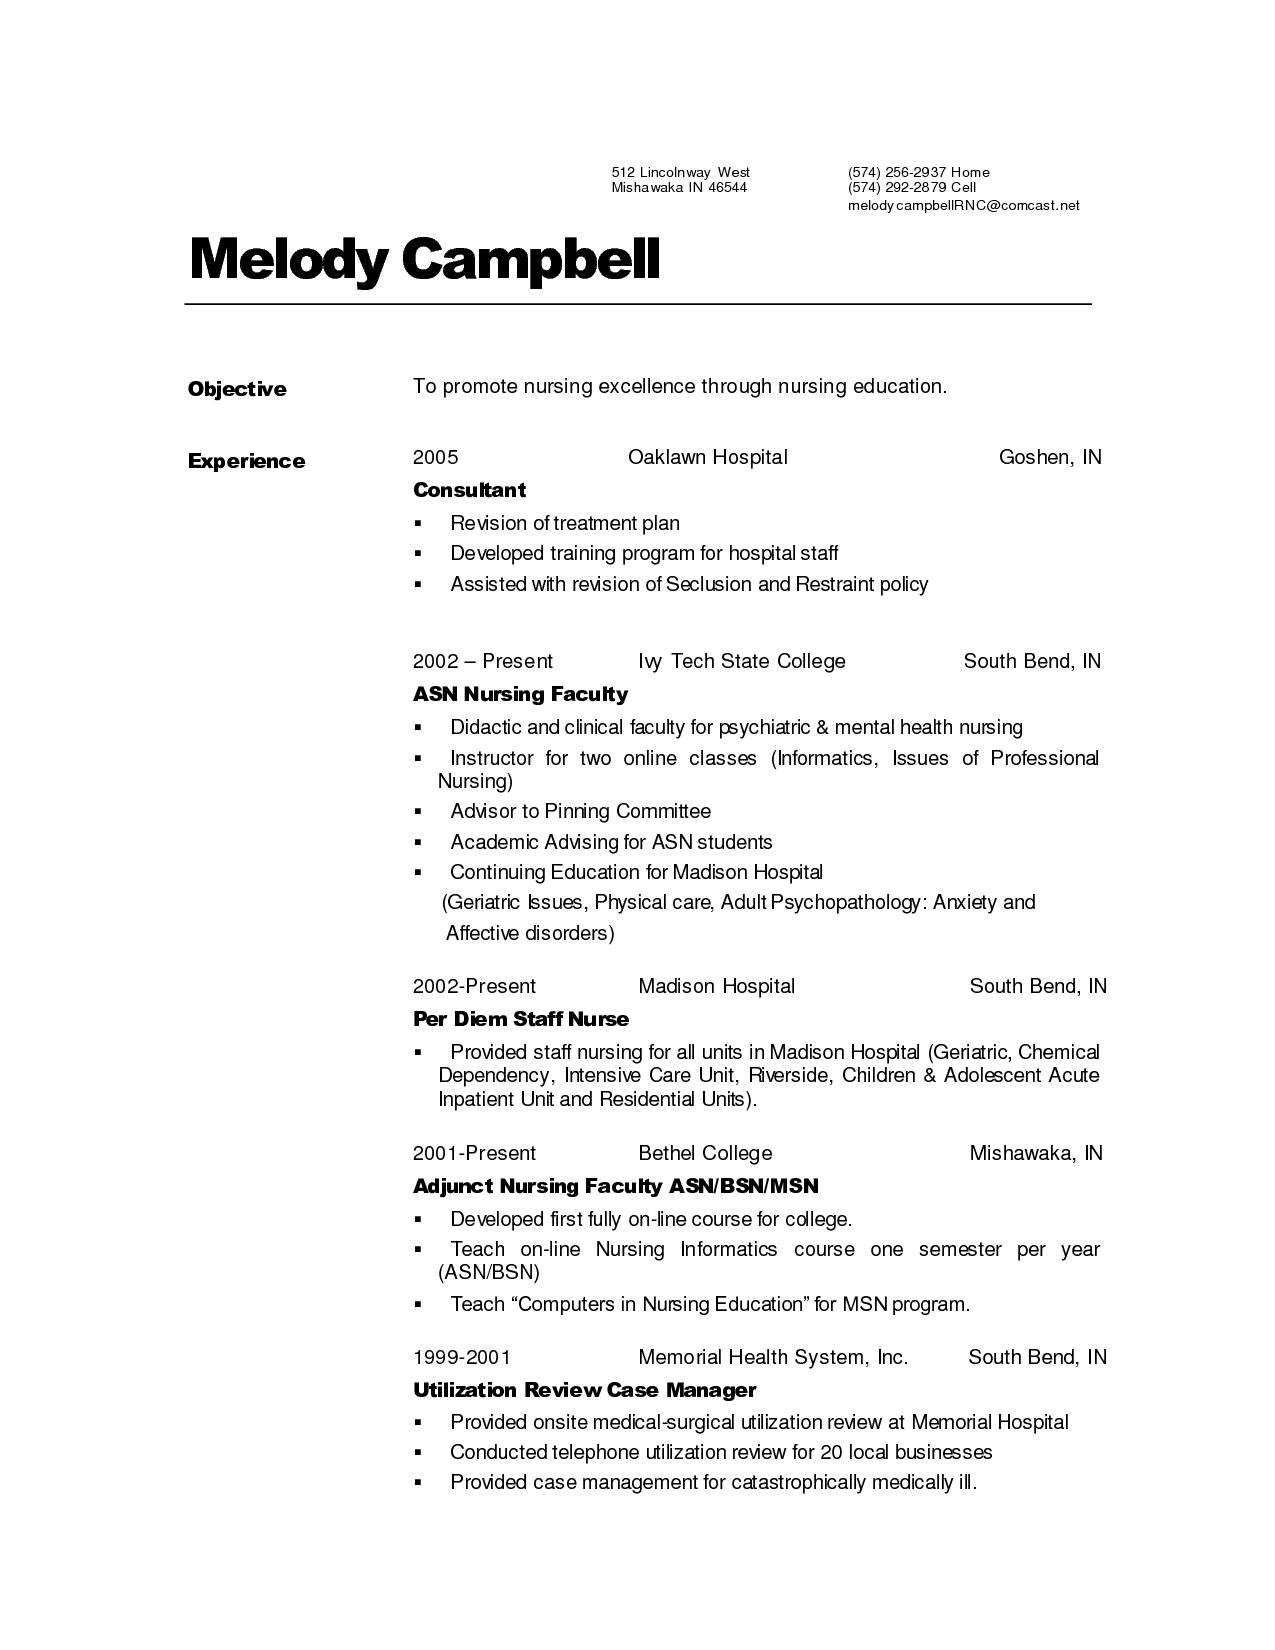 professional resume template httpwwwjobresumewebsite 27aa01632eab2f45e2d0c346831d6fad 555561304011837651 college instructor sample resume free - Sample Nursing Student Resume